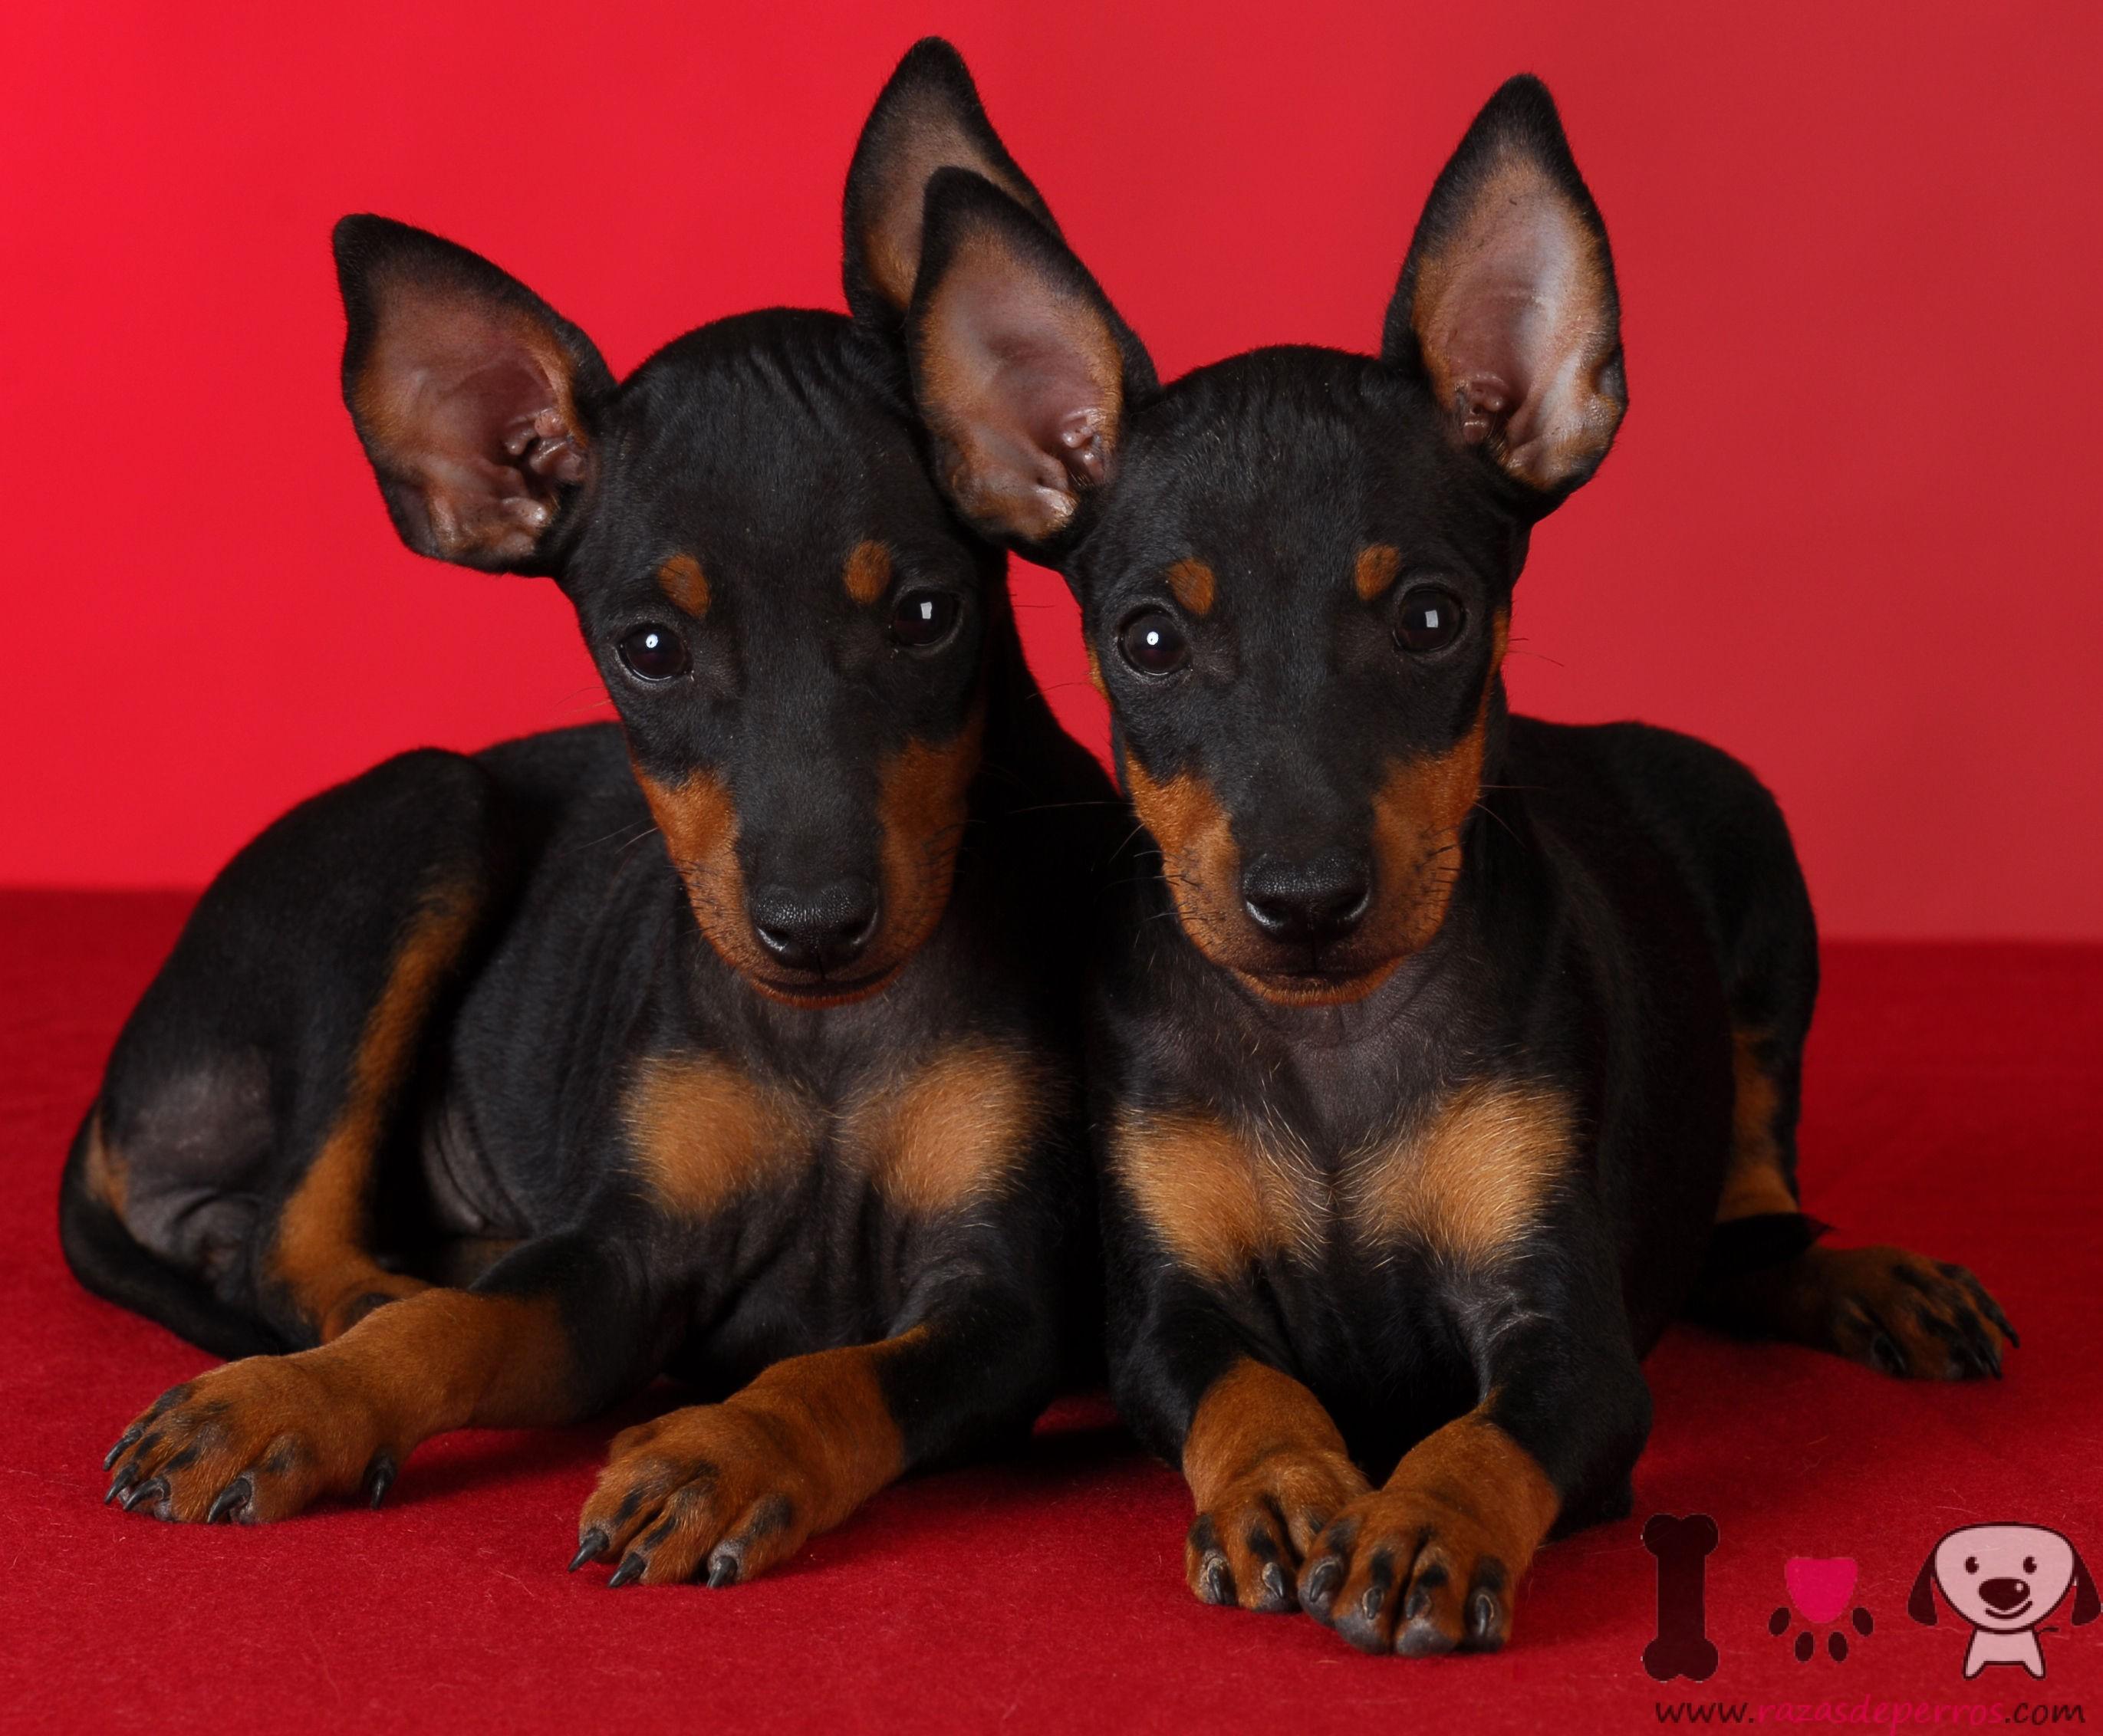 Cachorros de manchester terrier negros